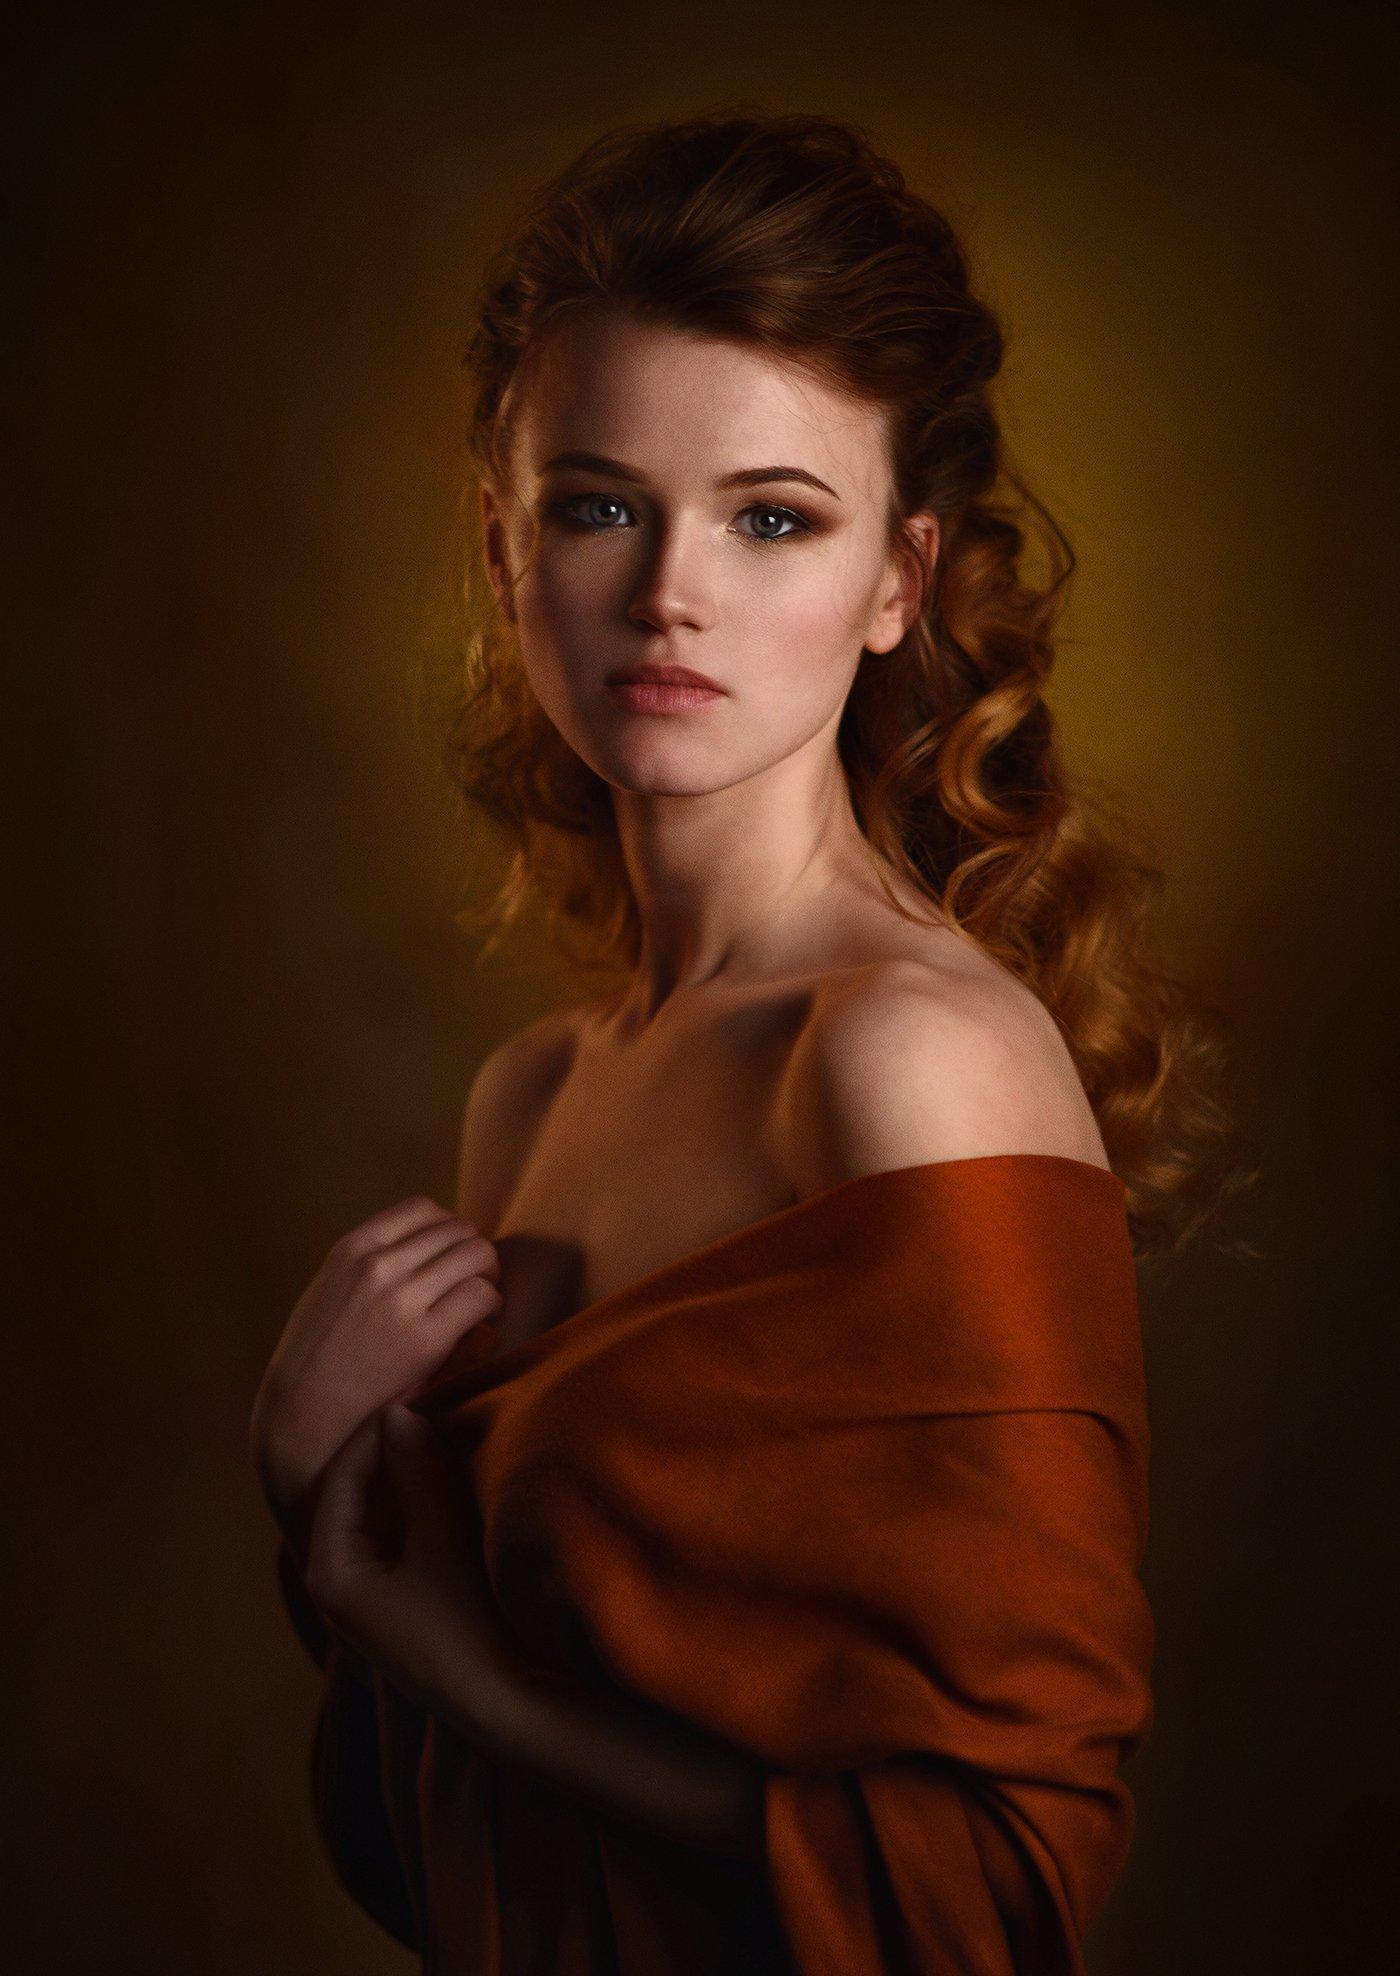 девушка, студия, свет, тень, взгляд, рыжая, платок, Александр Жосан